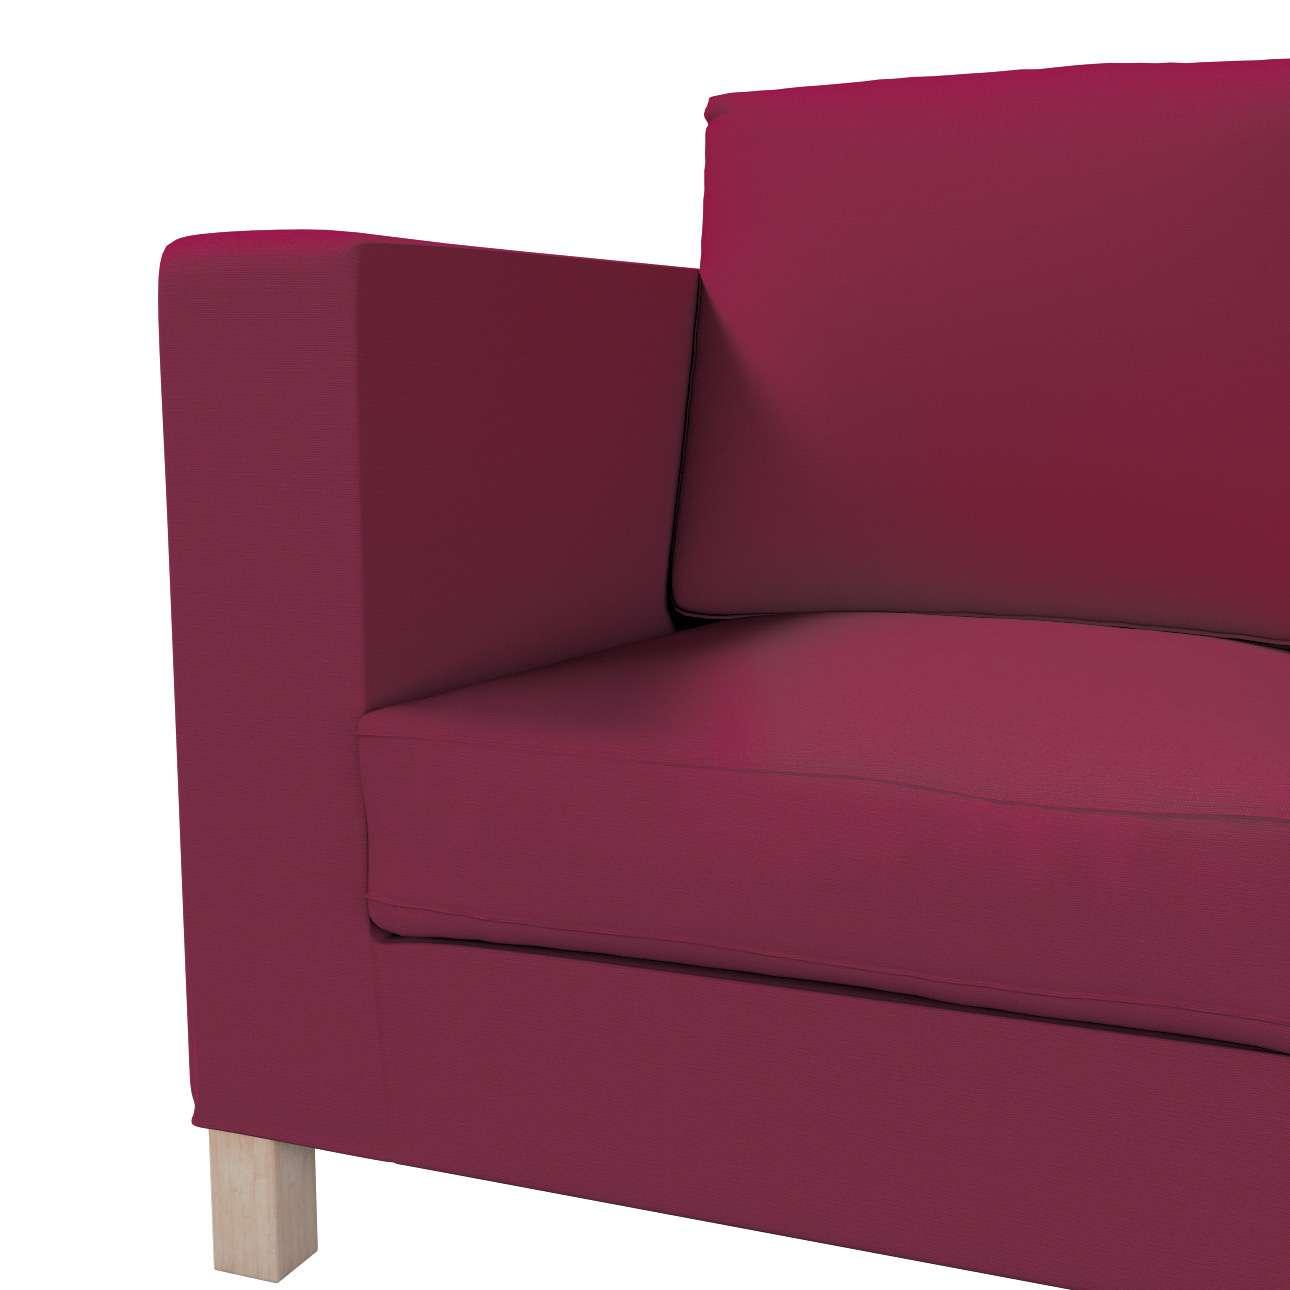 Karlanda klädsel <br>3-sits soffa - kort klädsel i kollektionen Panama Cotton, Tyg: 702-32